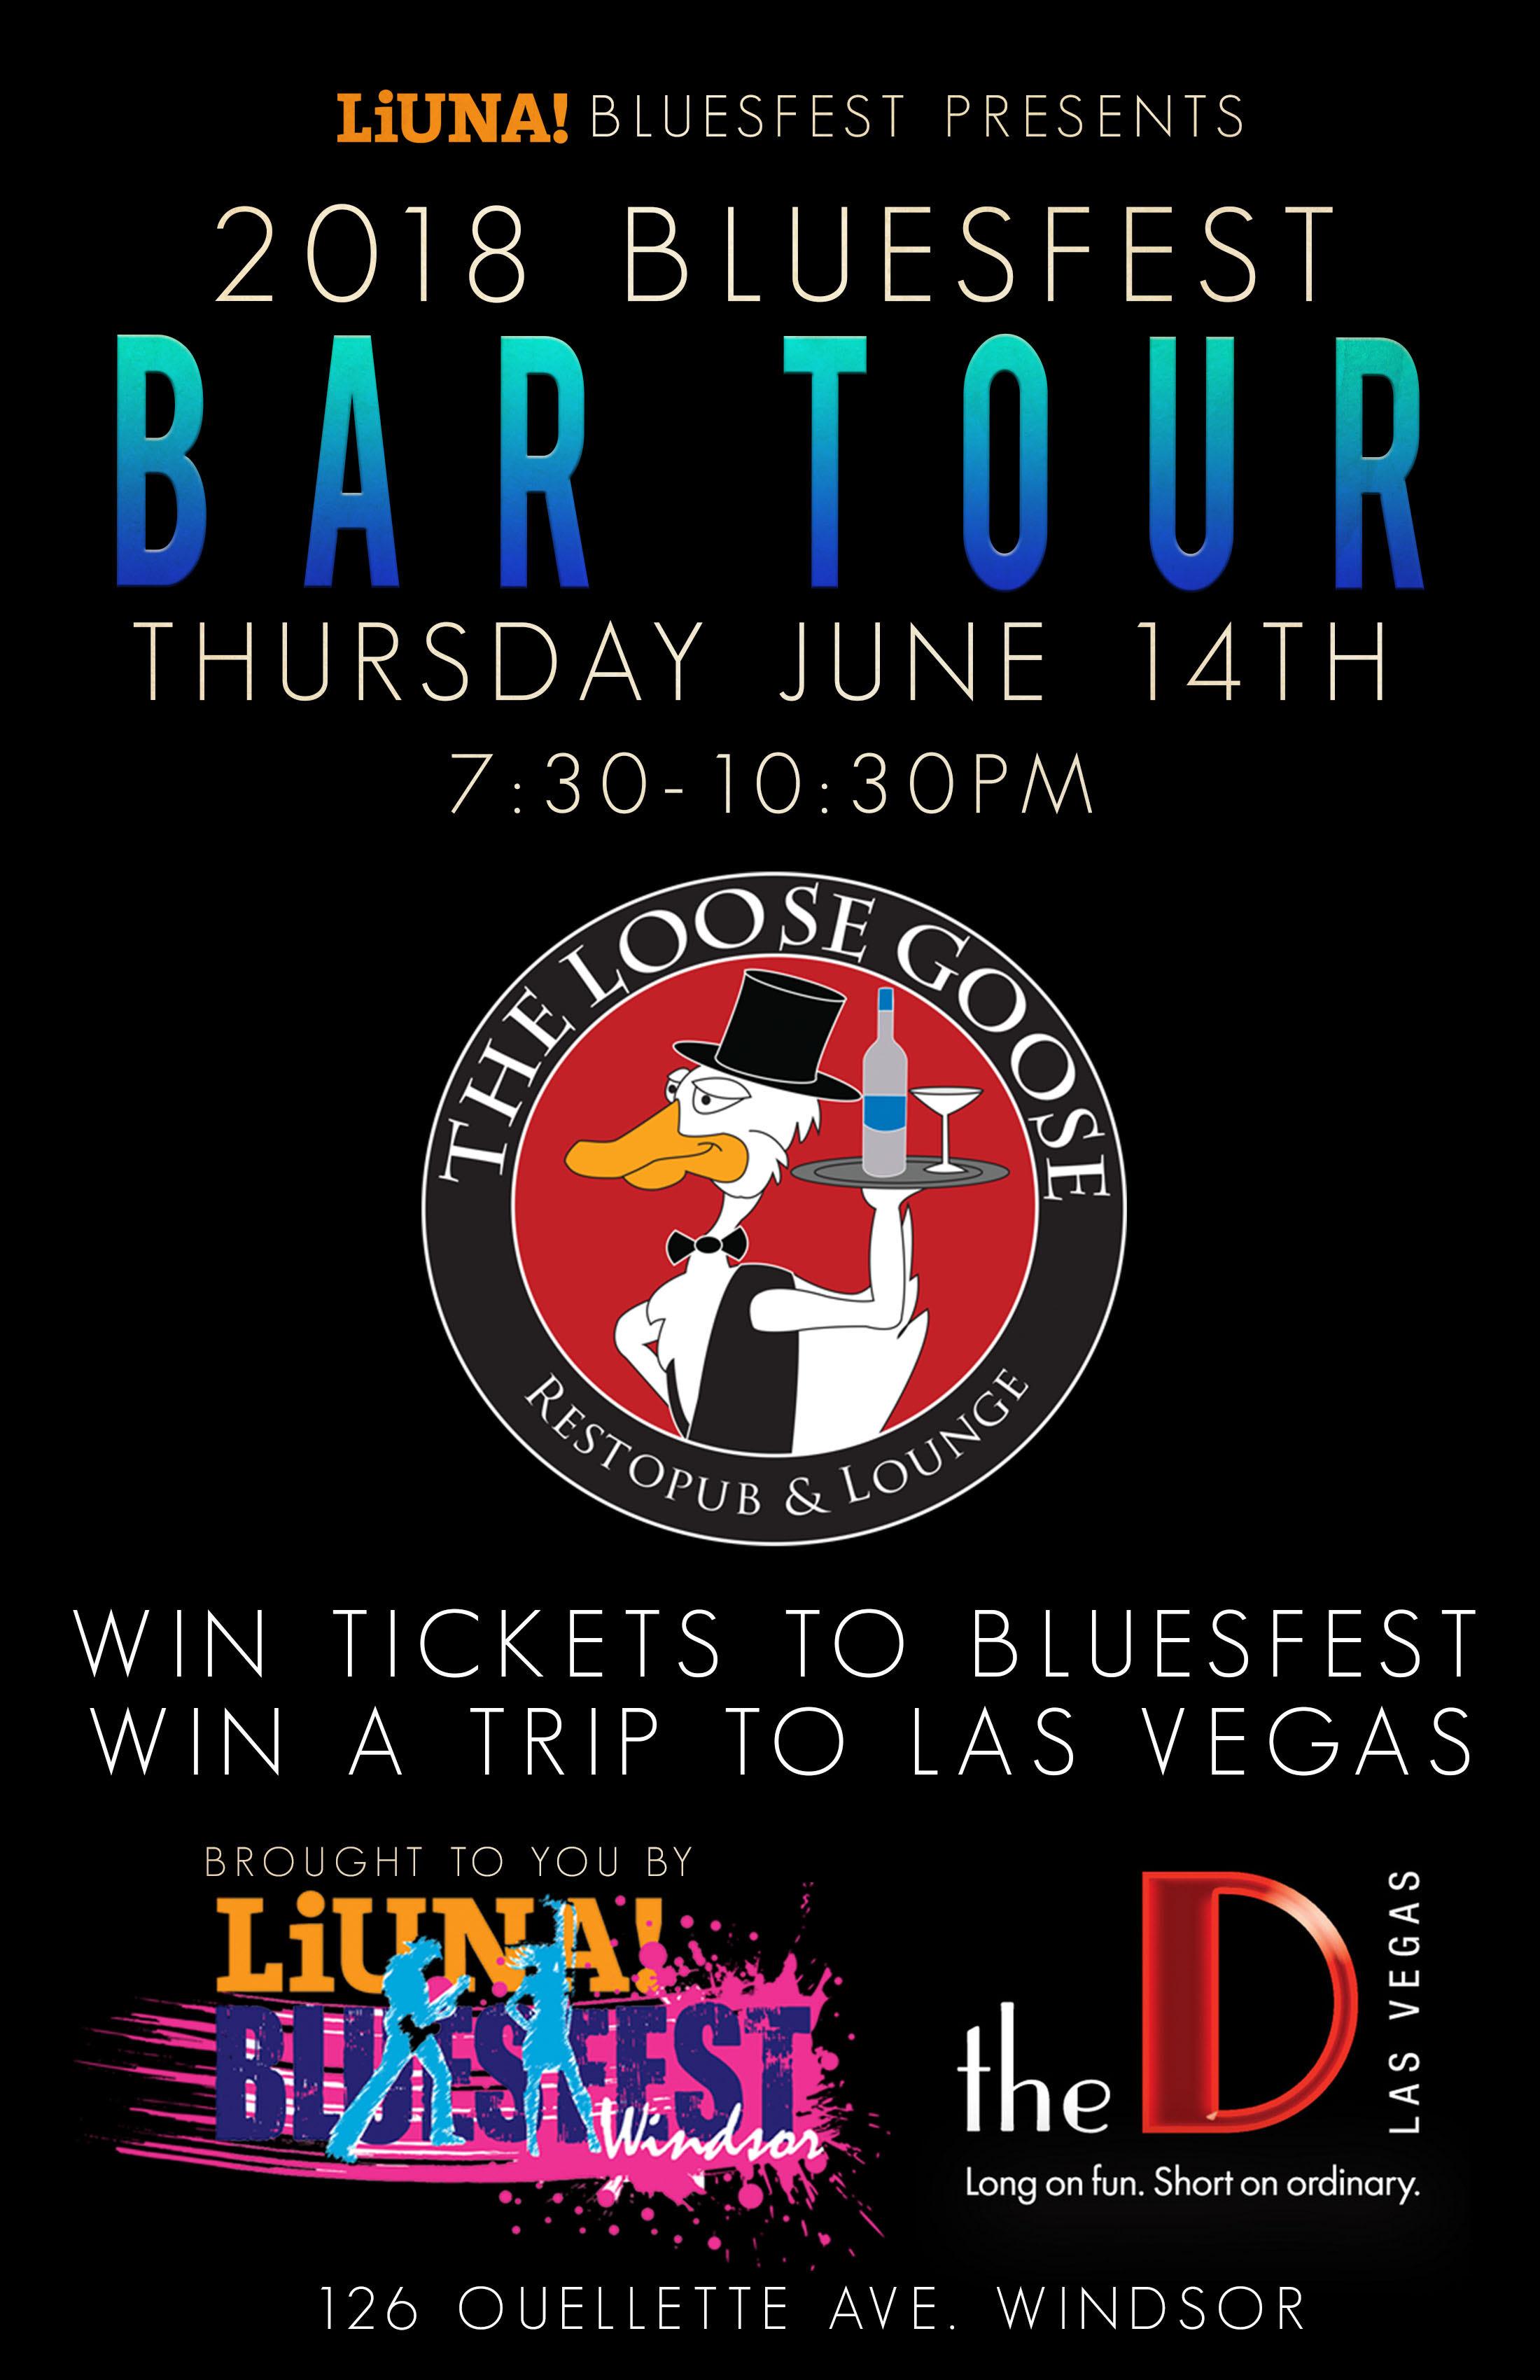 2018_Bluefest_Bar_Tour.jpg